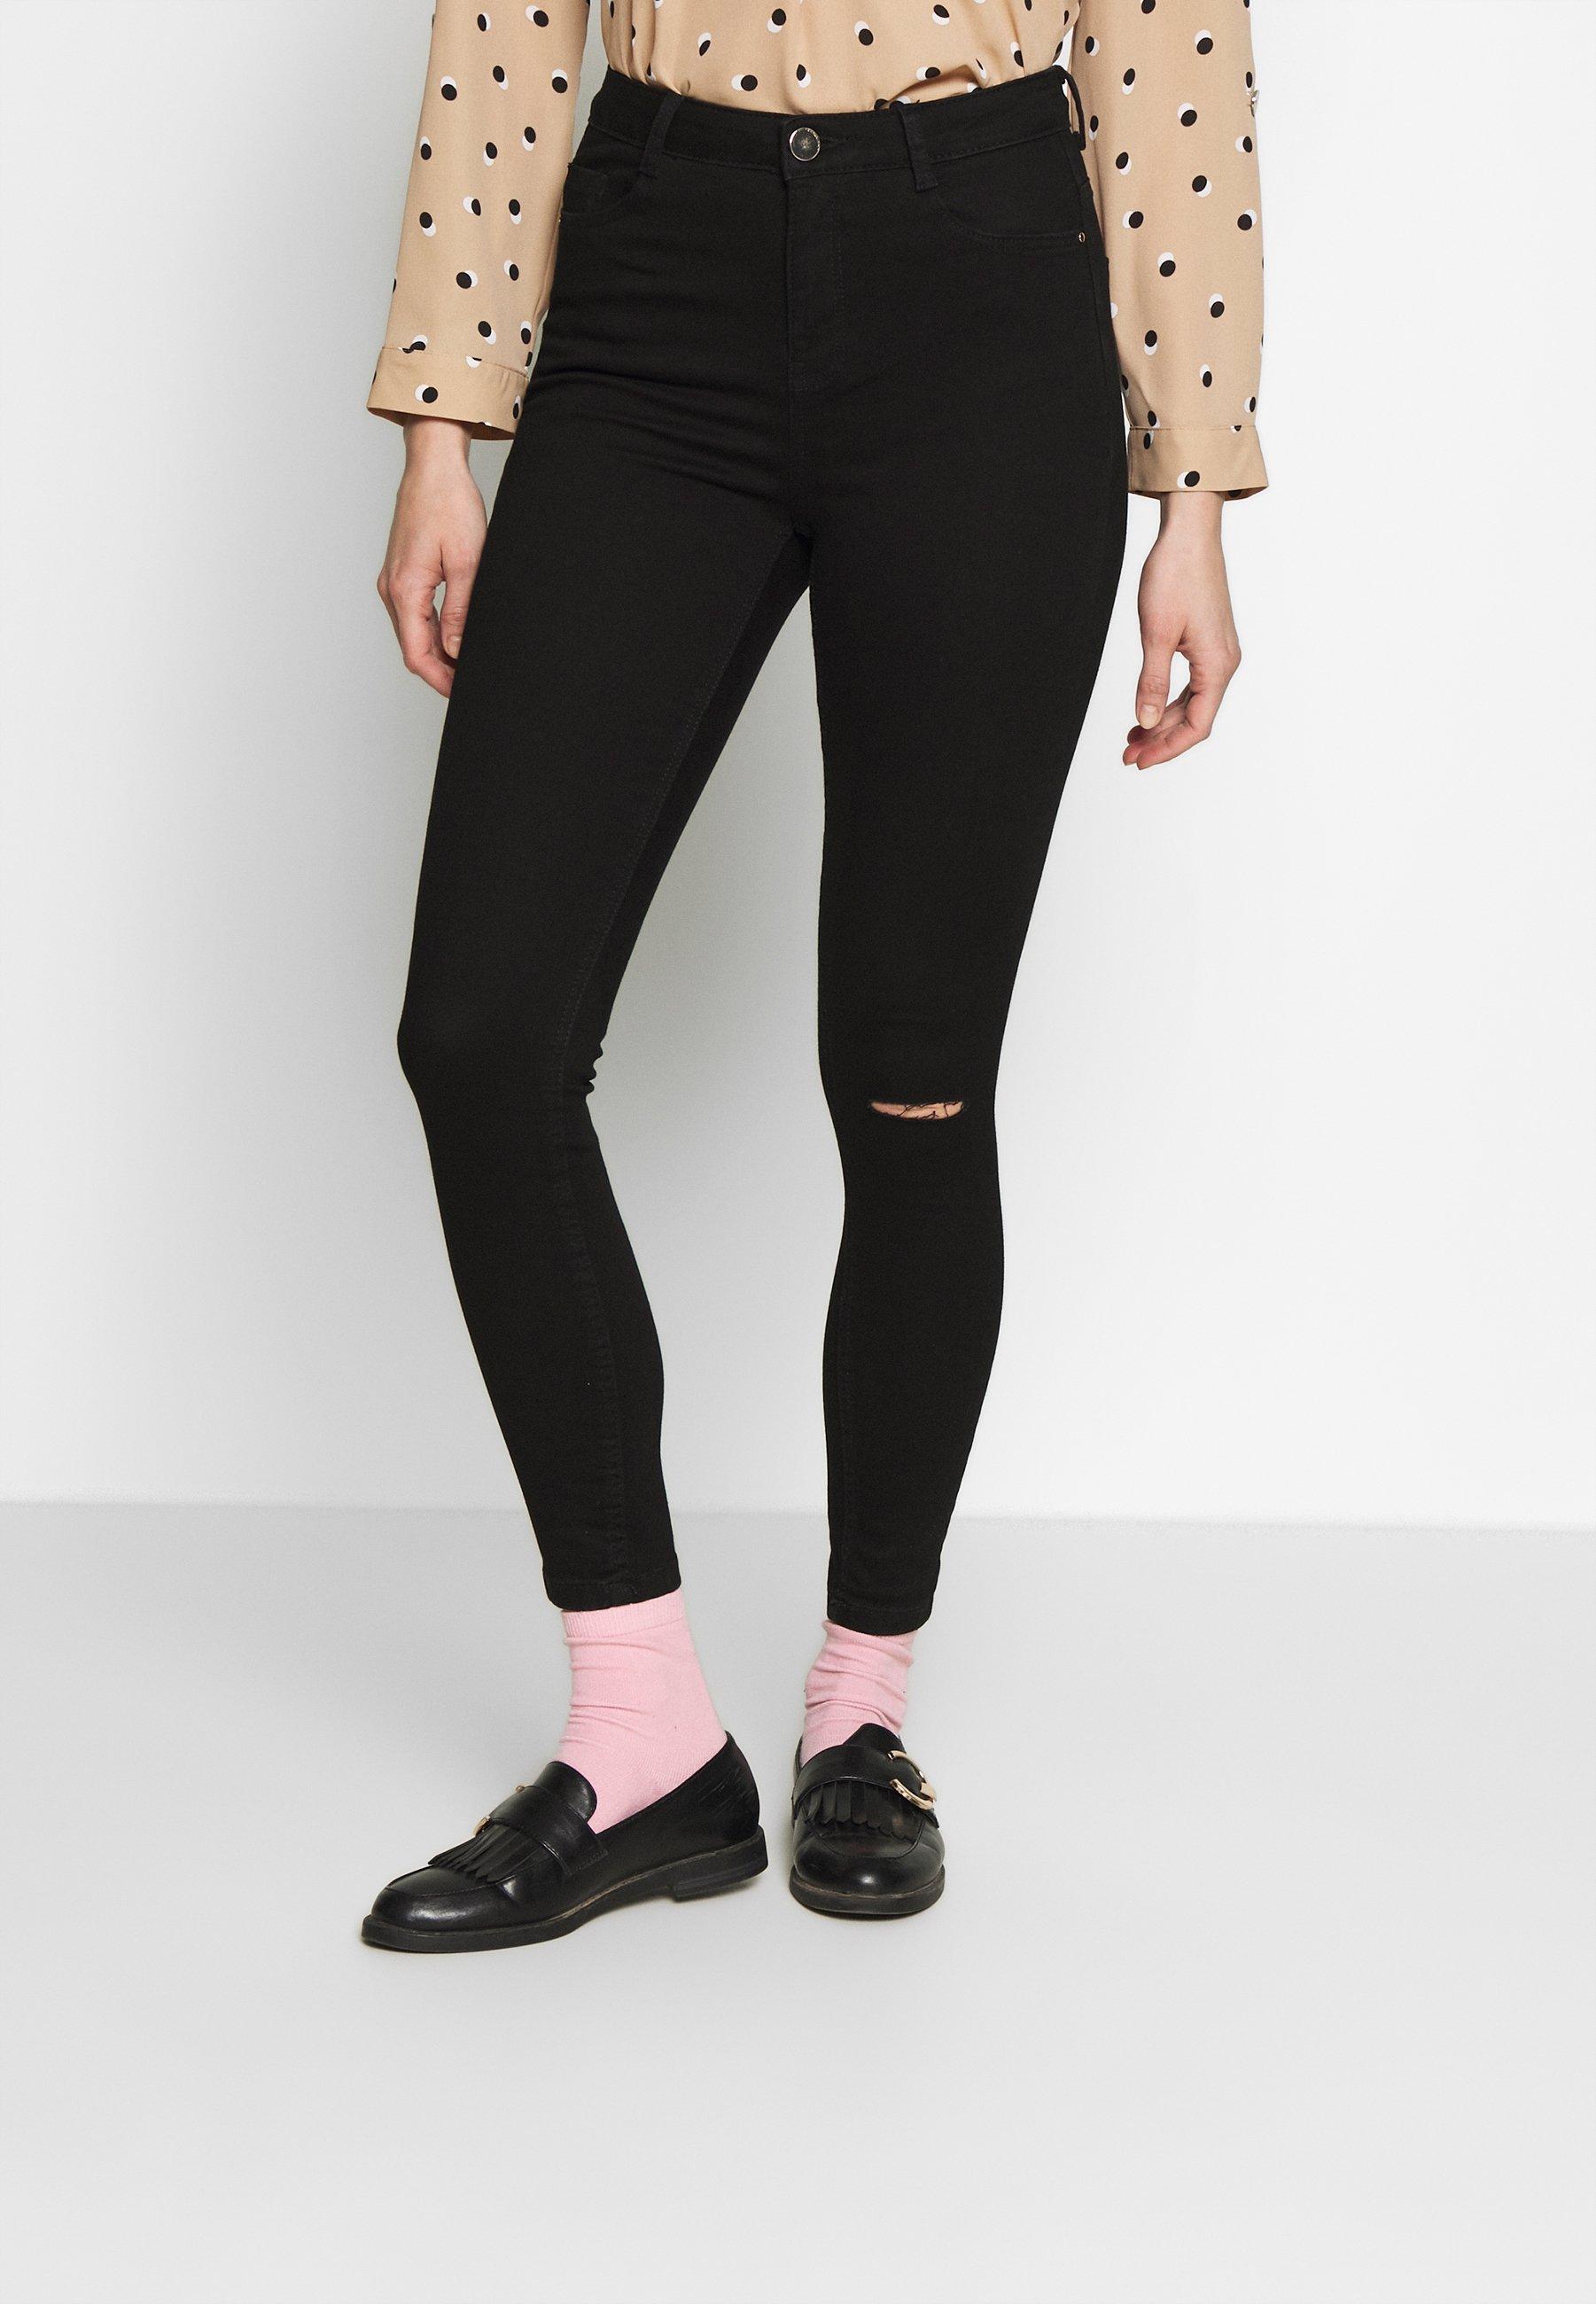 Dorothy Perkins RIP SHAPING - Jeans Skinny - black - Jeans Femme ySt2K